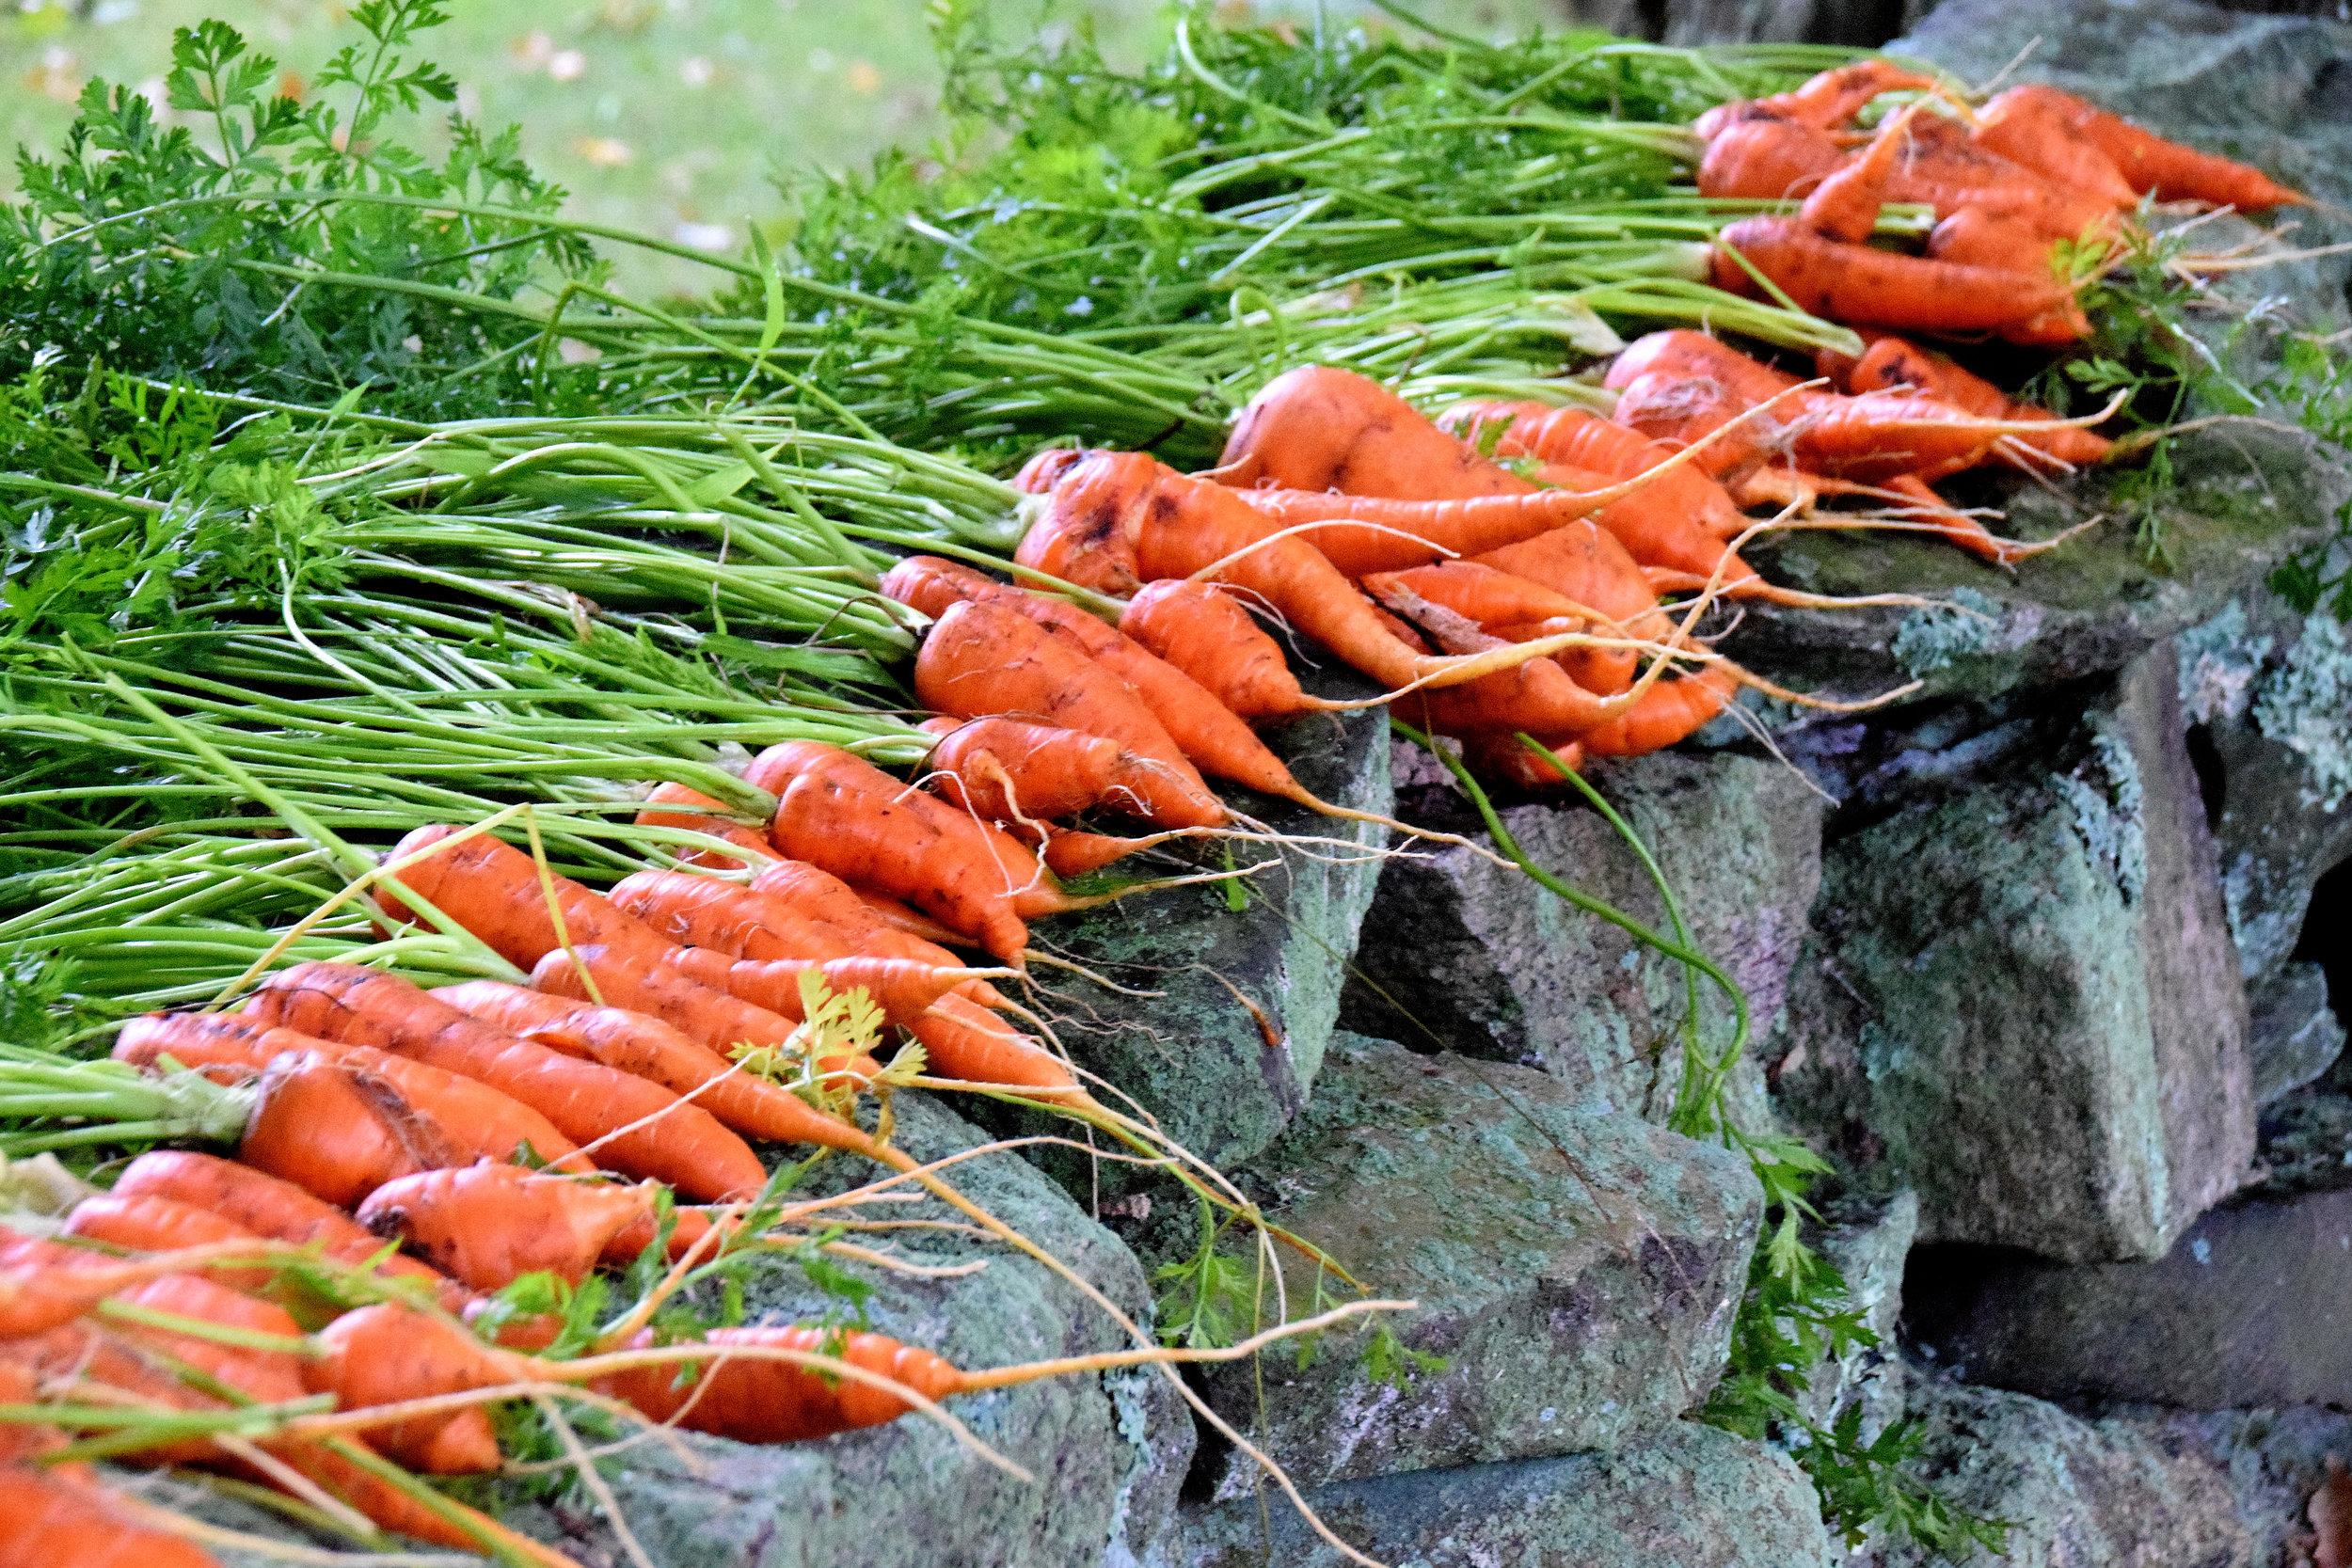 Carrots1 008.JPG